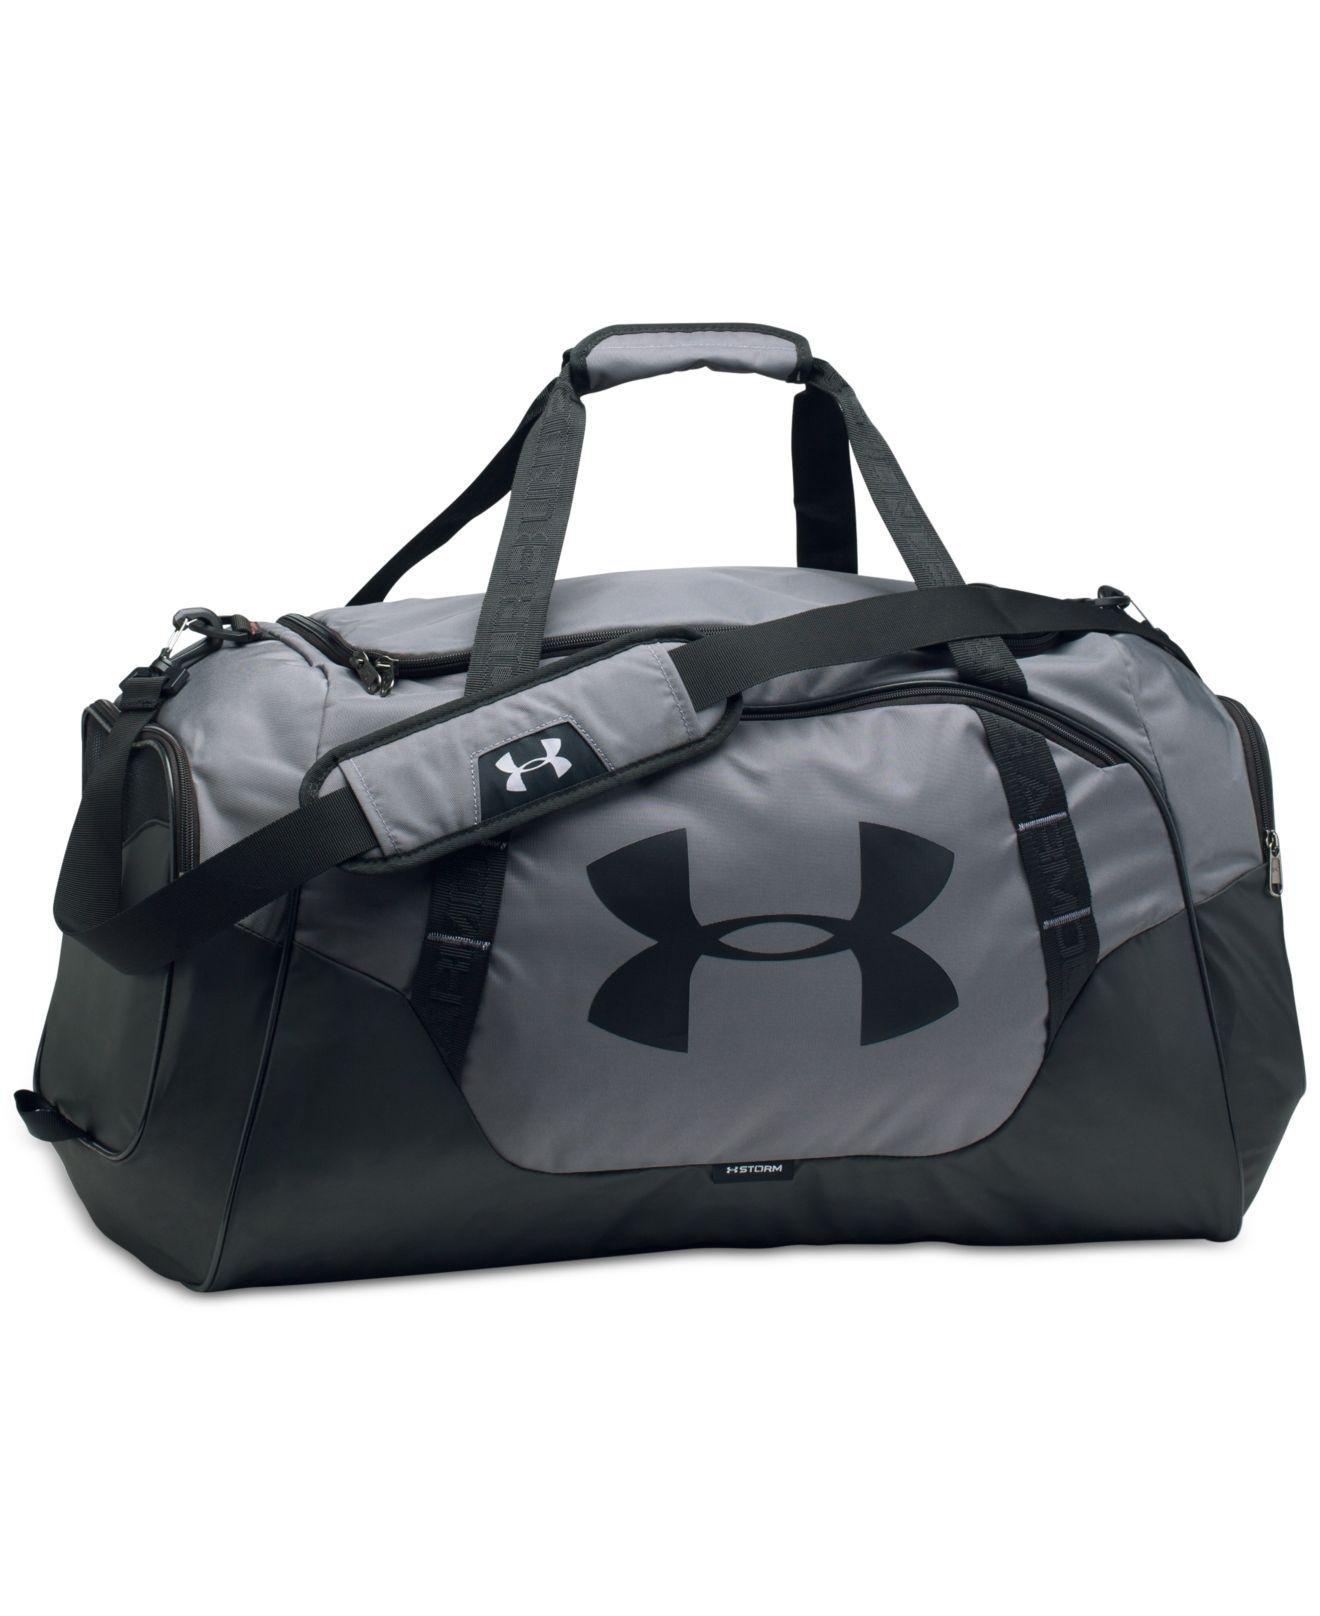 Lyst - Under Armour Undeniable Storm Duffel Bag in Gray for Men f2f57e3e7799e